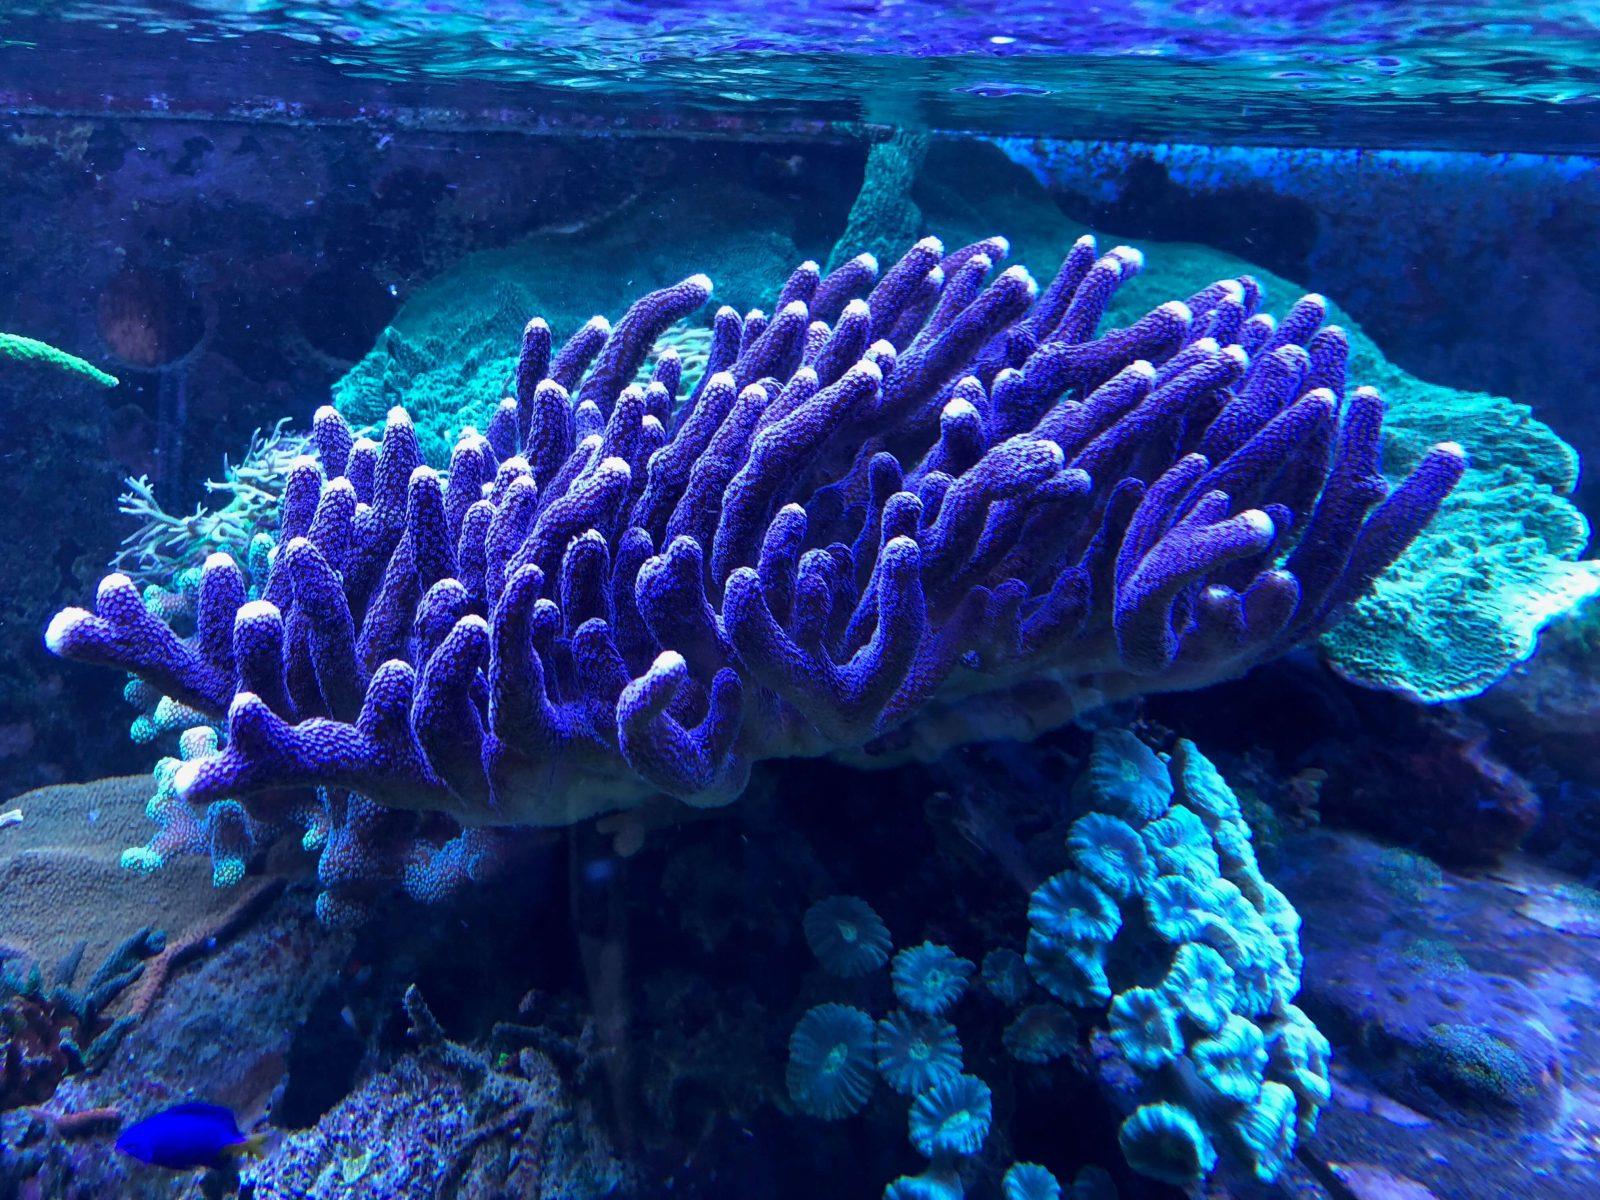 Aminosäuren Meerwasseraquarium